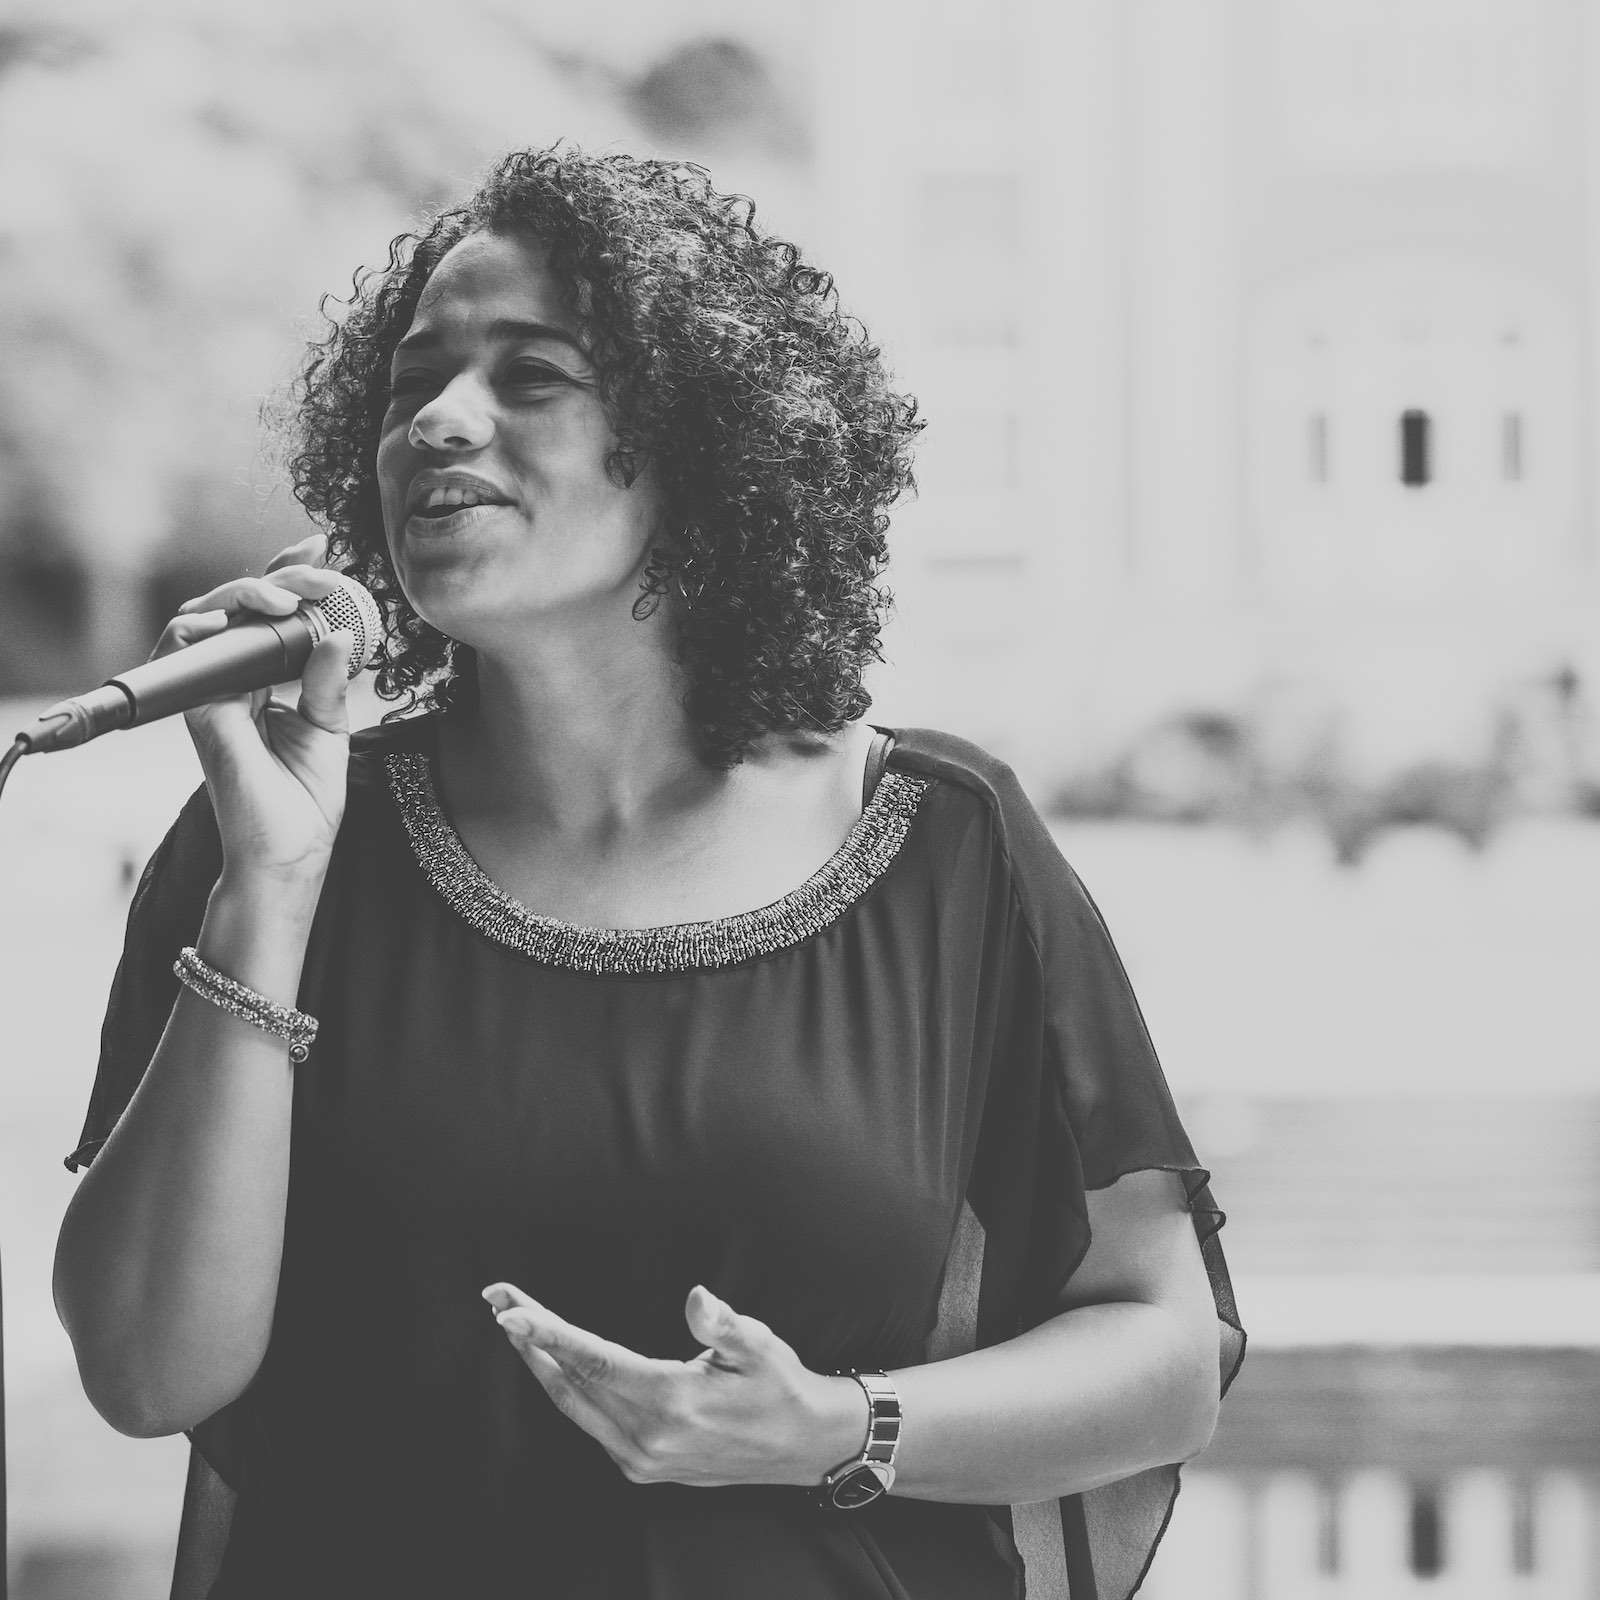 hochzeitssängerin | Hannover | Mieten | Sängerin | Kirchensängerin | Hochzeit | Lieder | Sängerin | Trauung | Sängerin | Trauung | Sängerin | Kirche | Buchen | Nathalie | Chérestal | Lehmann | Eventservice